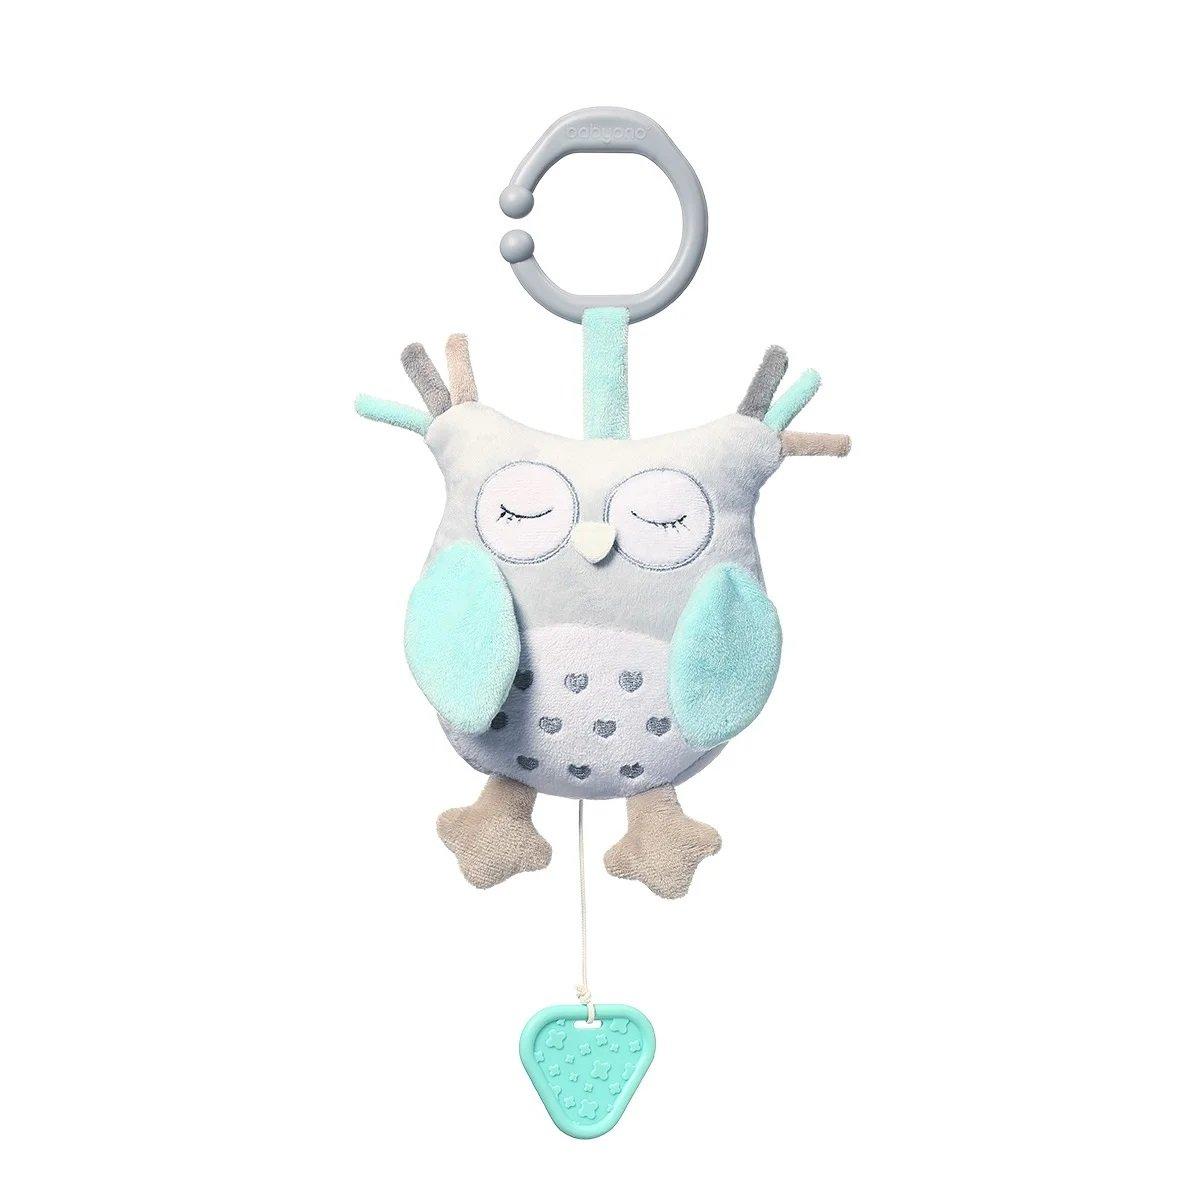 Plyšová hraèka s klipem a vibrací OWL SOPHIA